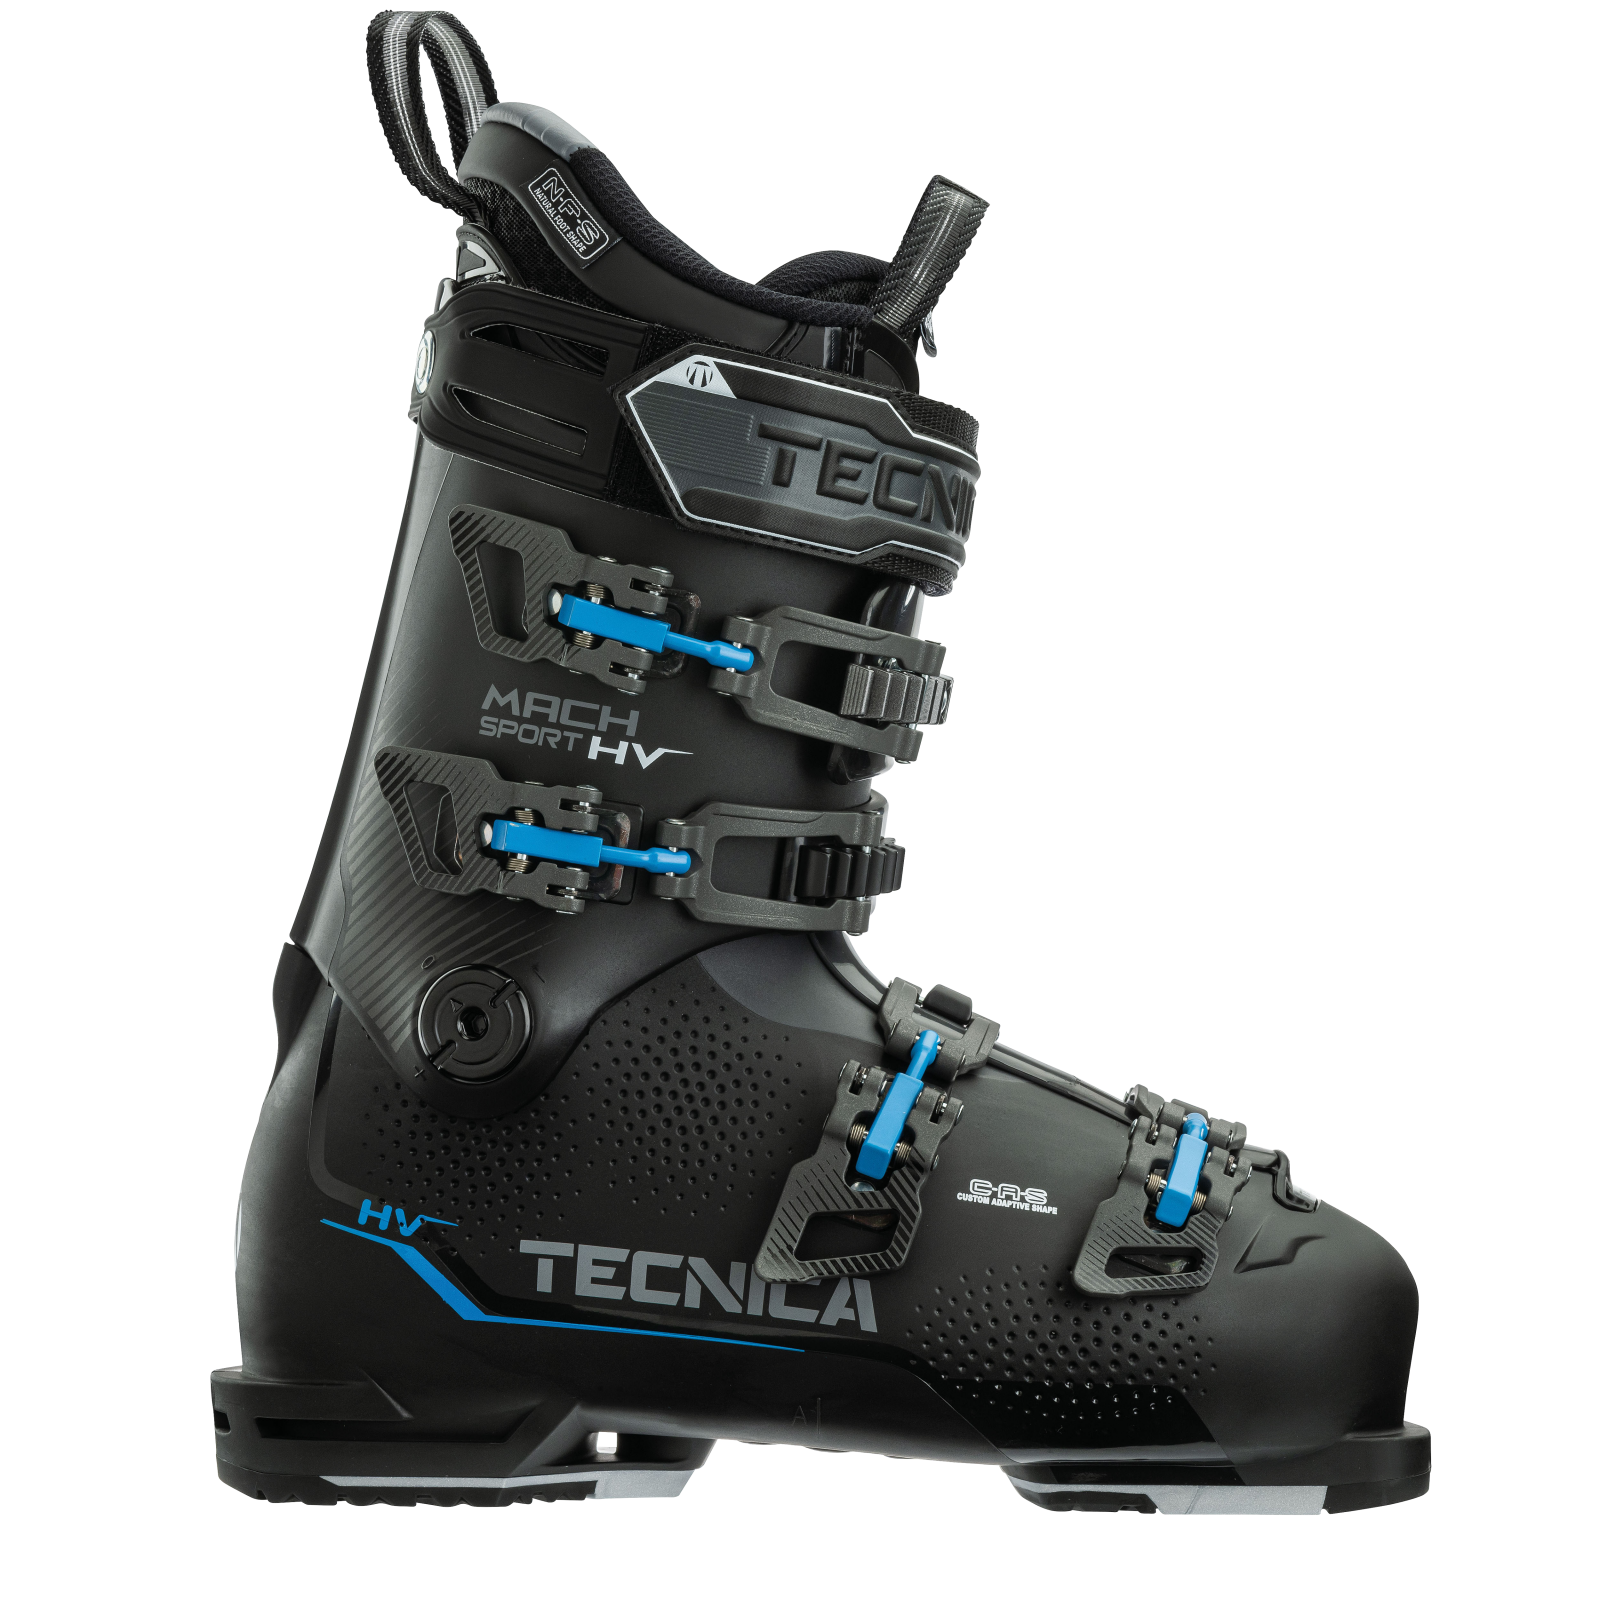 2021 Tecnica Mach Sport HV 110 Men's Ski Boots